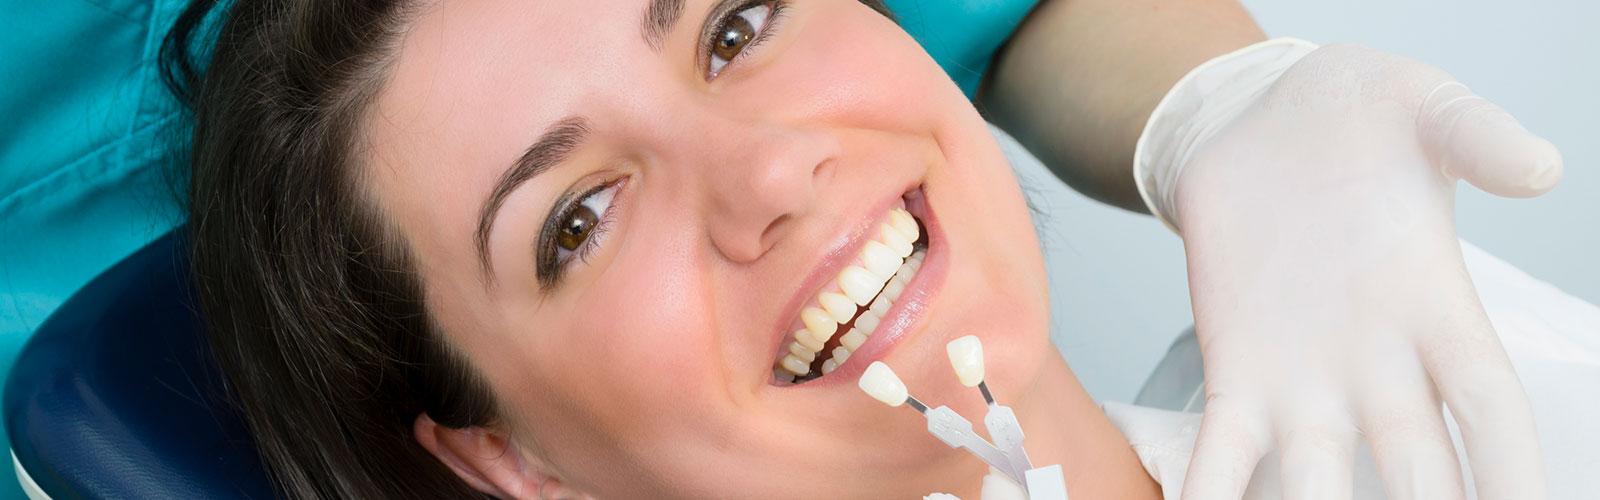 A patient trying dental veneers at Bella Hanono Family Dentistry